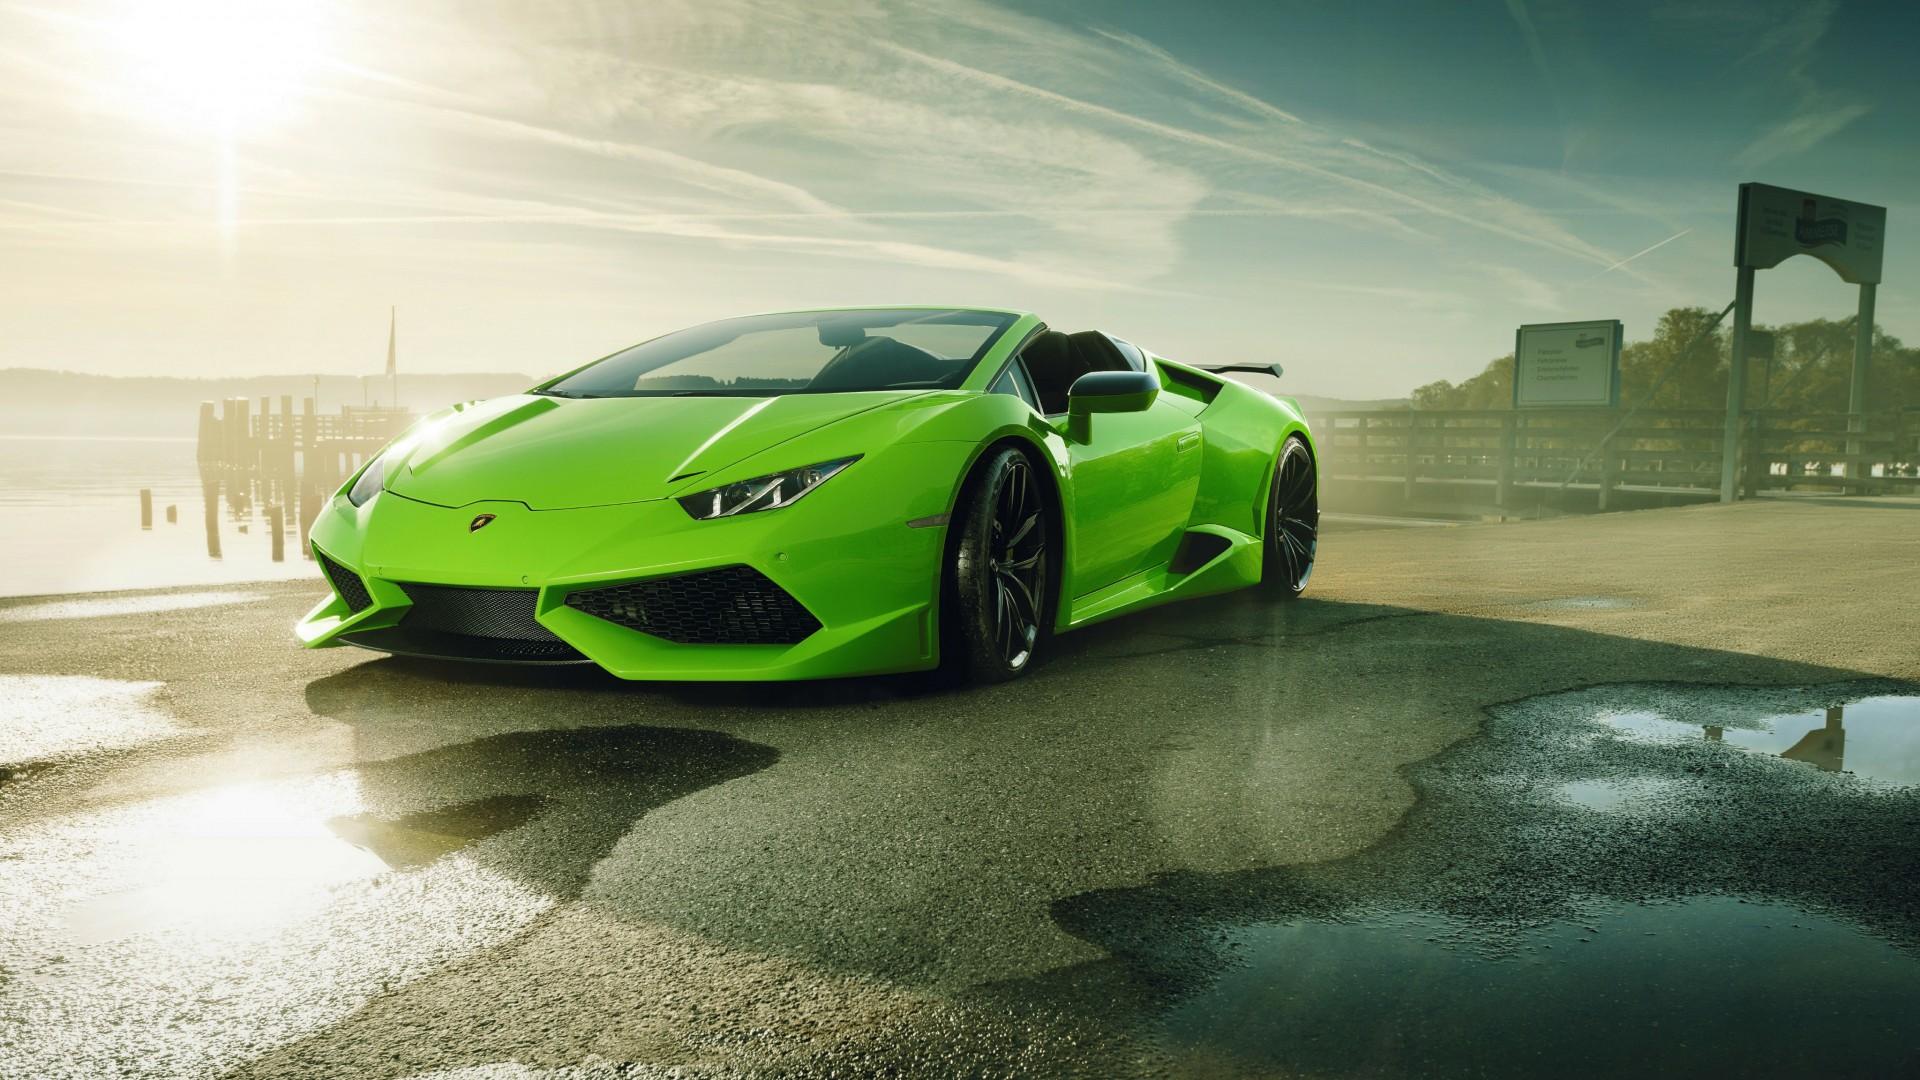 Full Hd Car Wallpapers 1080p Bmw Novitec N Largo Lamborghini Huracan Spyder 4k Wallpaper